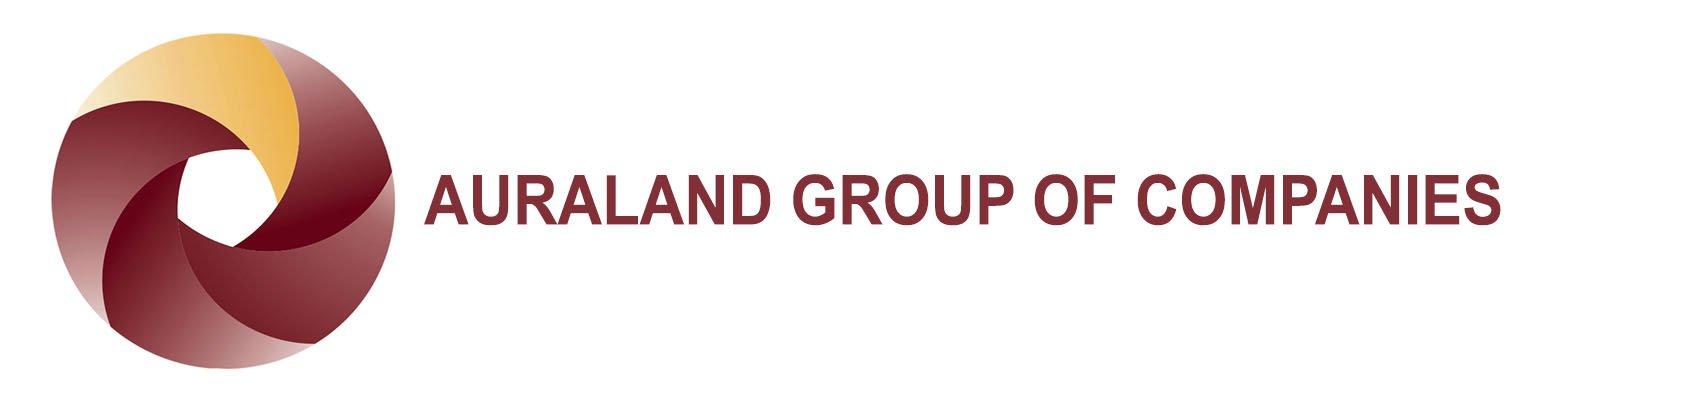 Auraland Group of Companies